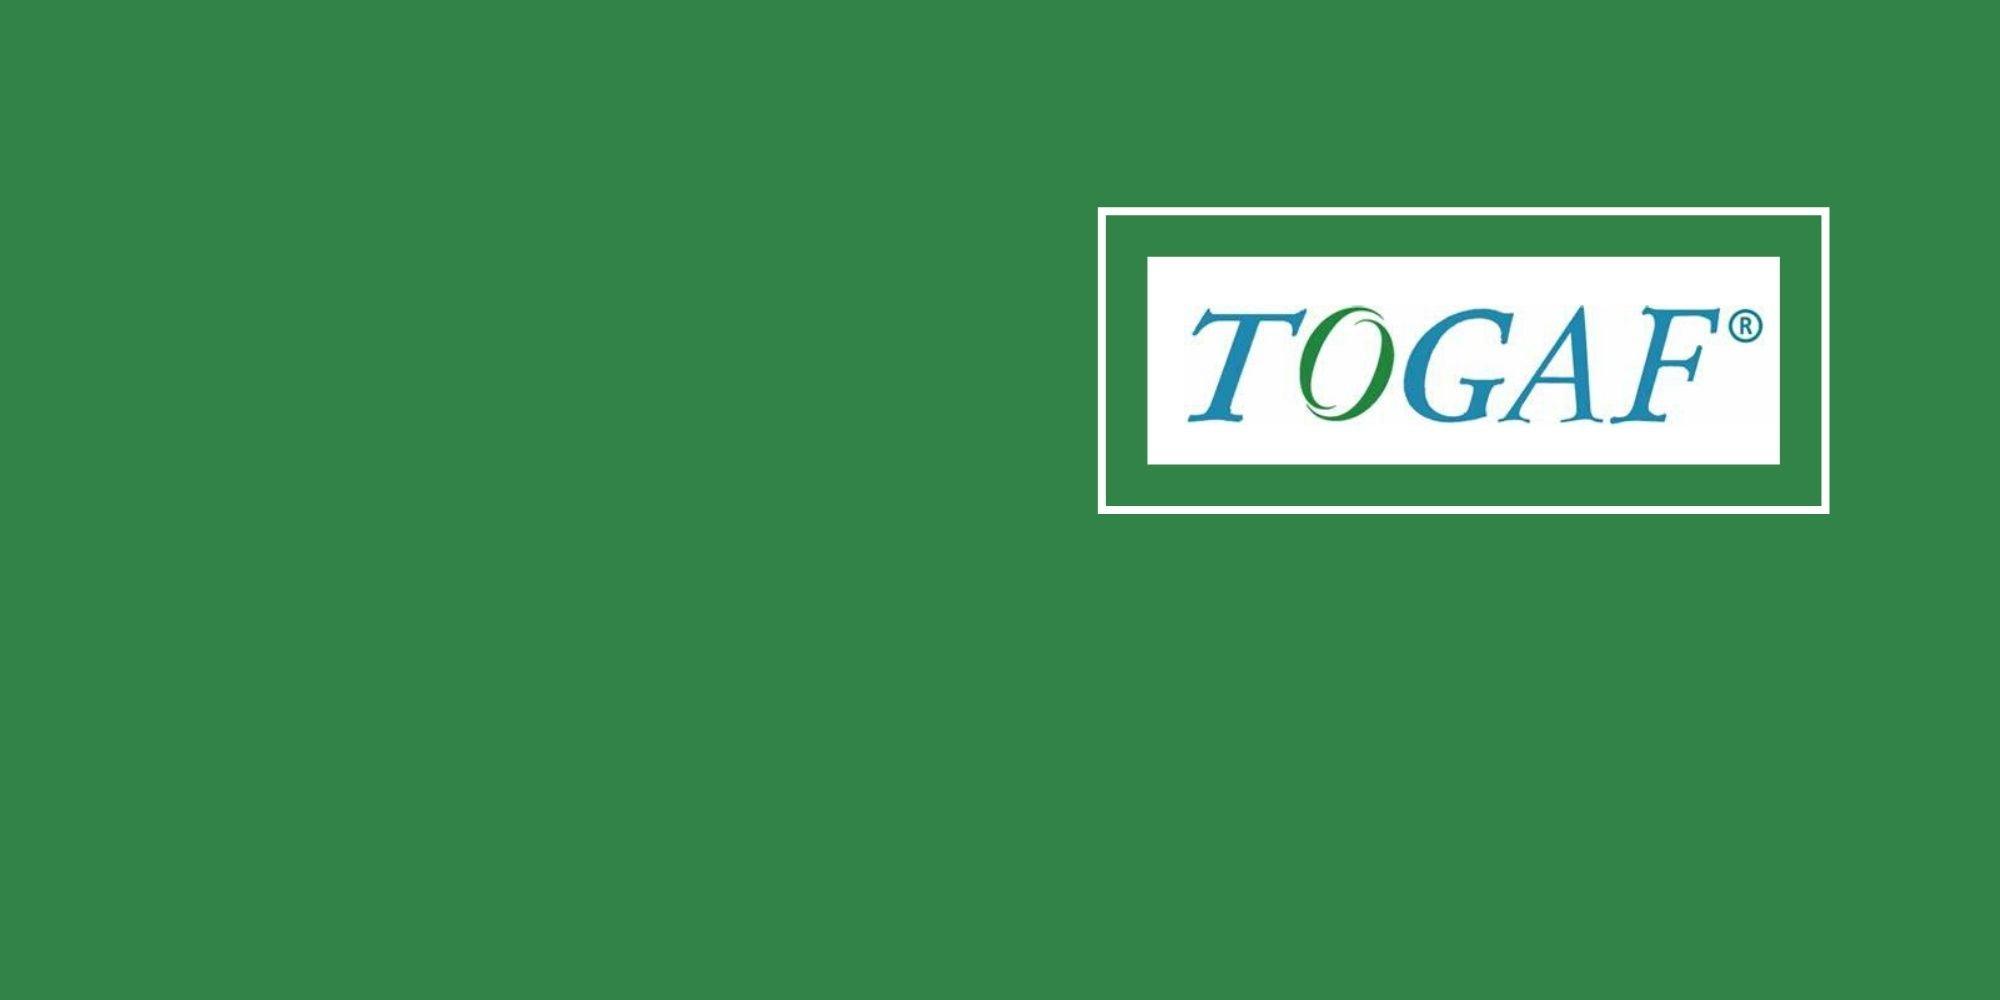 togaf (1)